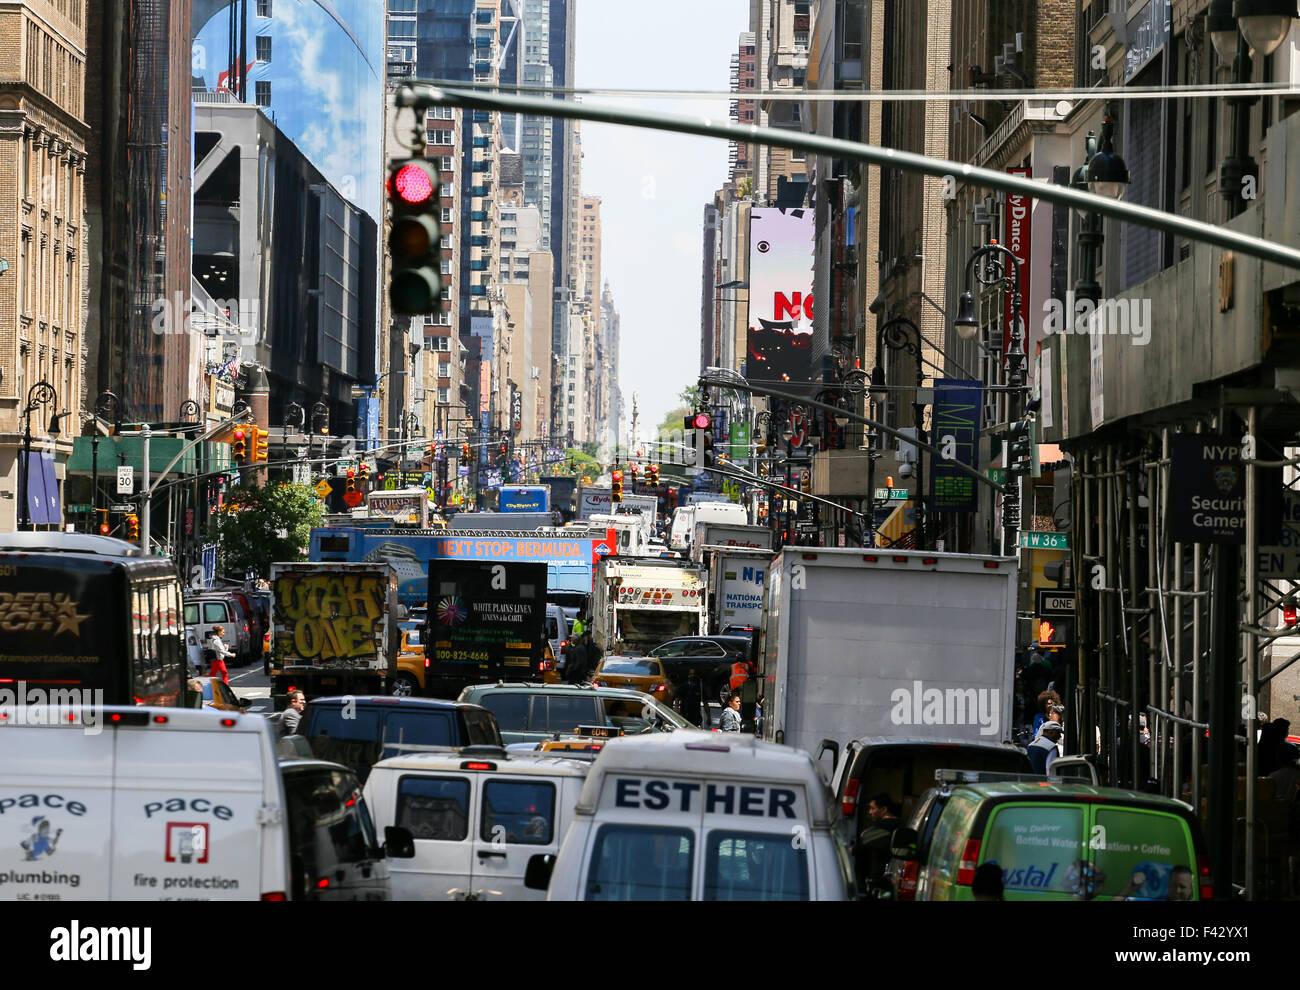 Calles de Nueva York Imagen De Stock